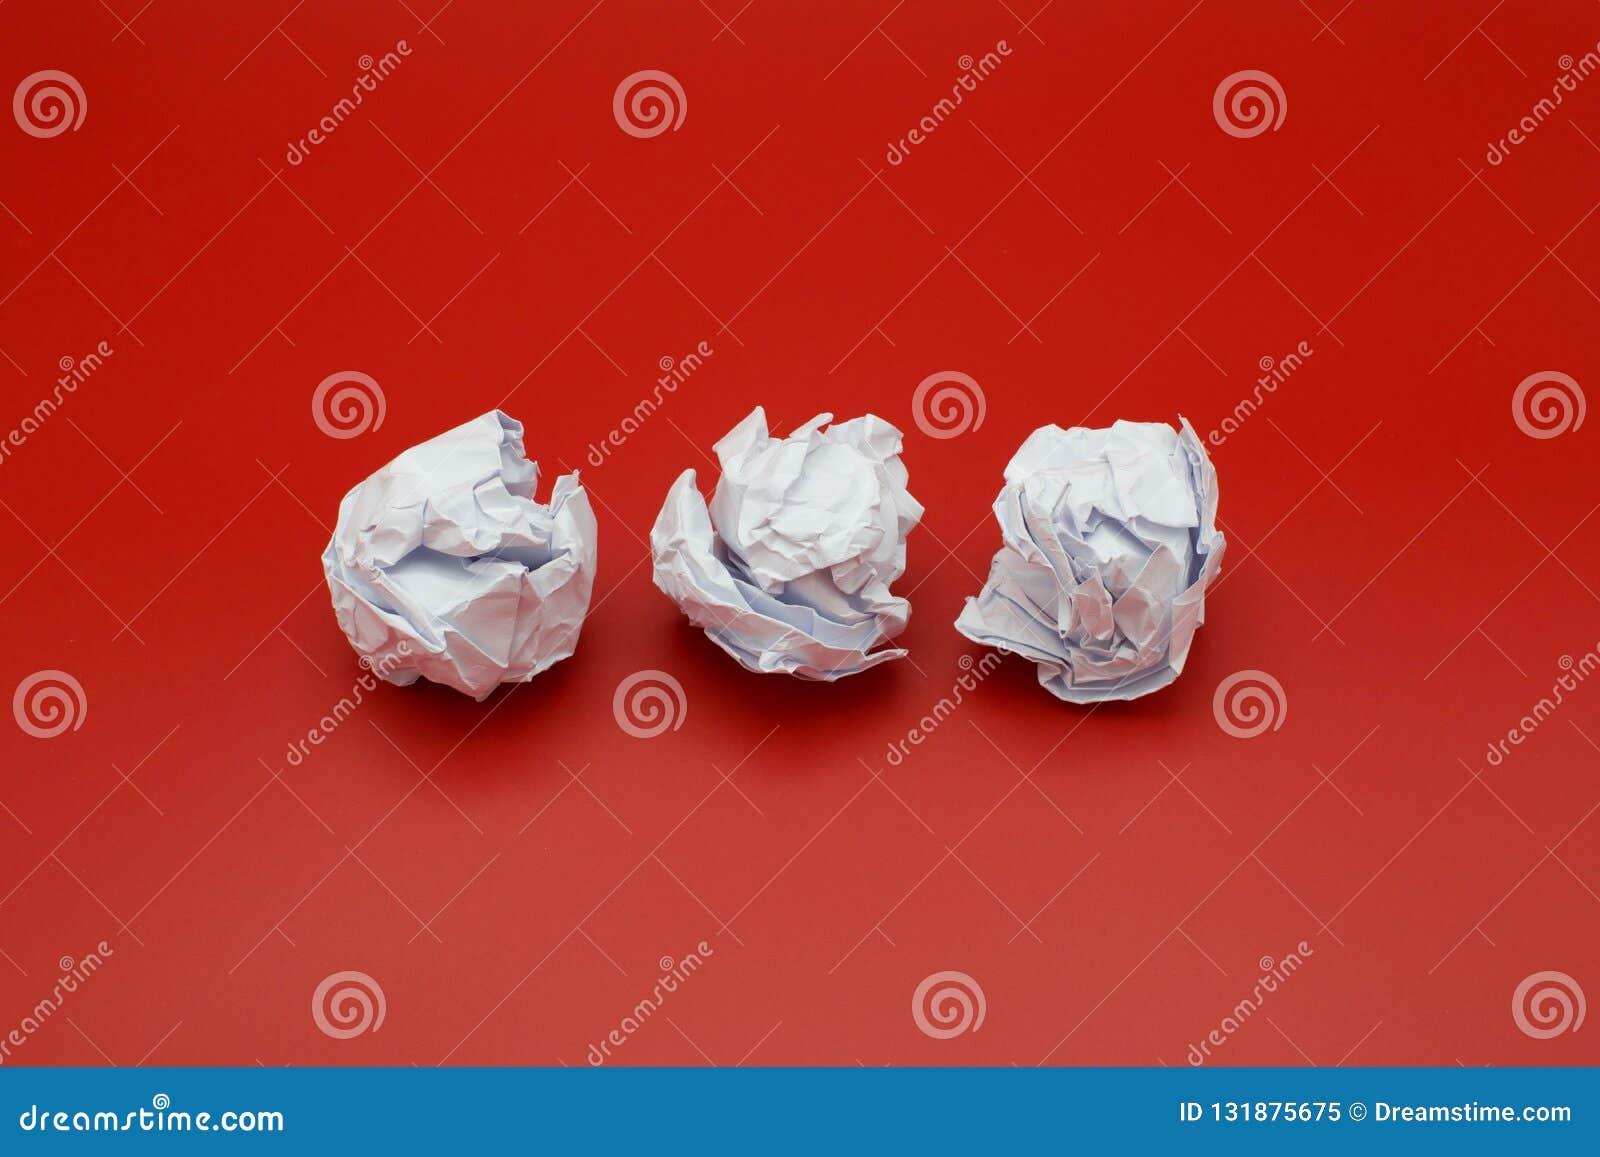 Screwed-up-paper